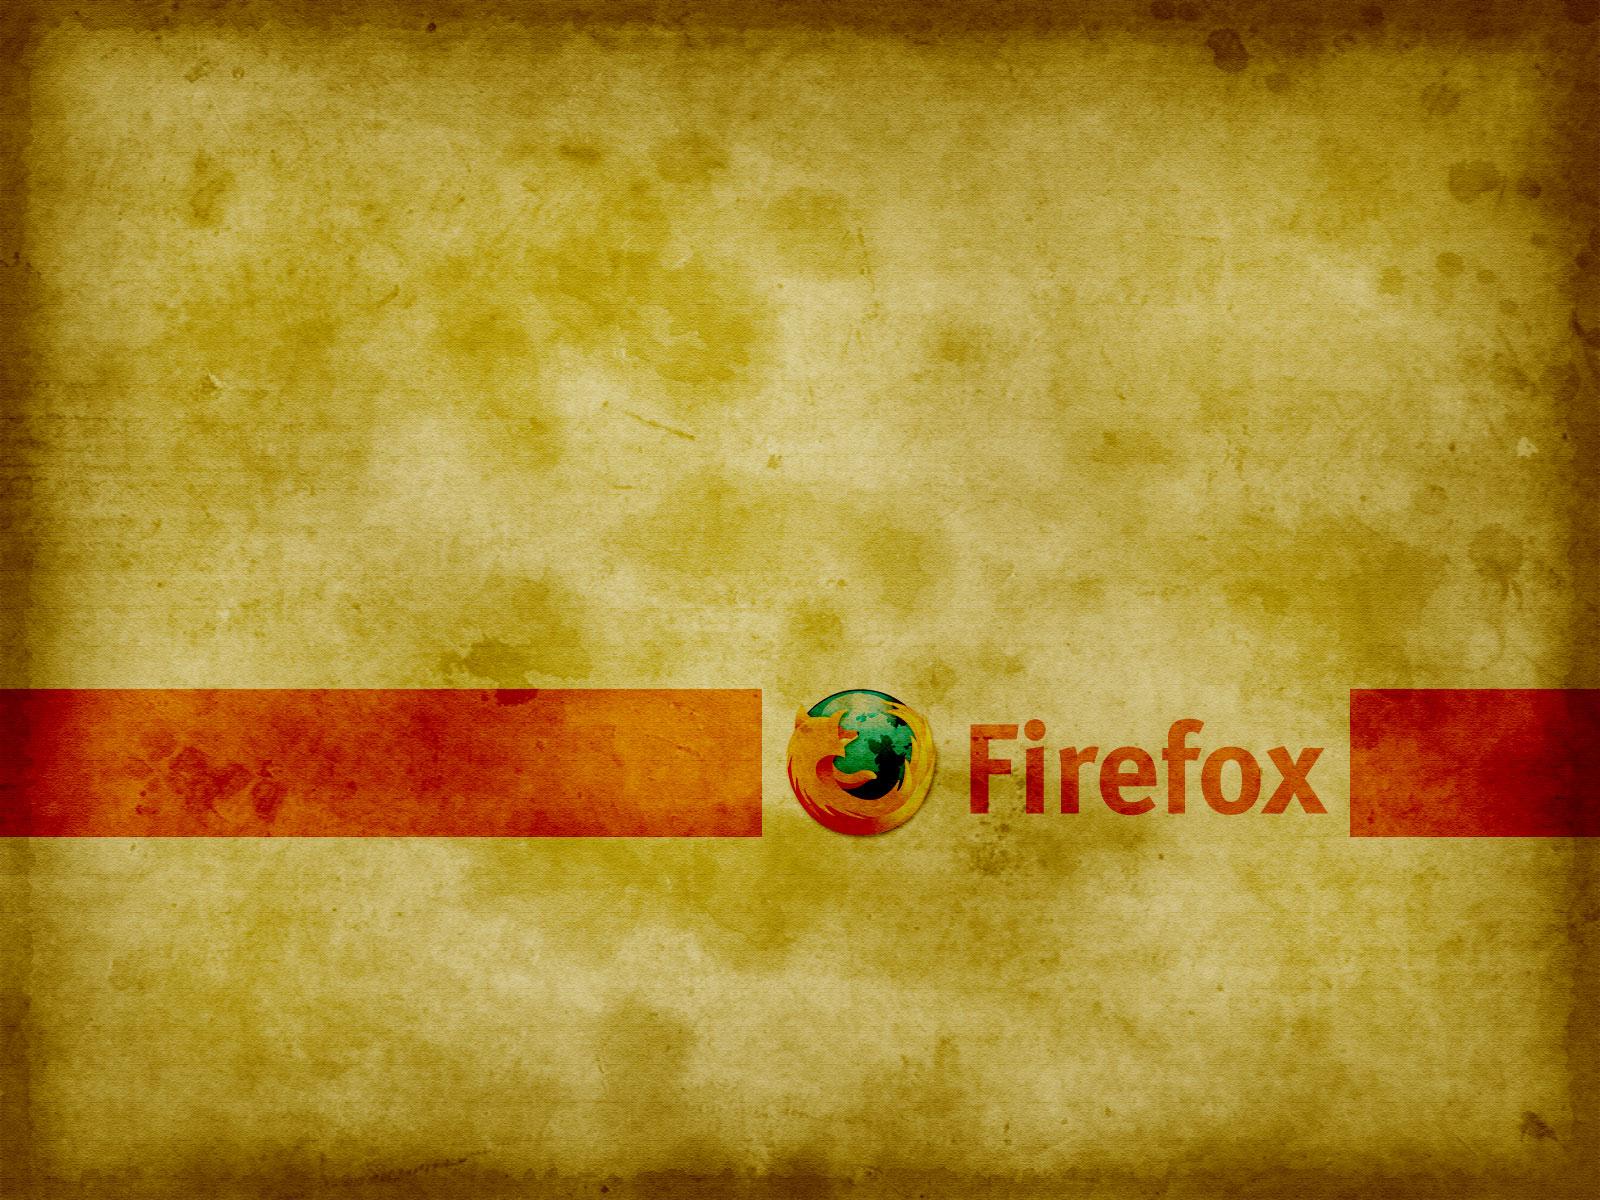 Firefox 2 by Coalbiter